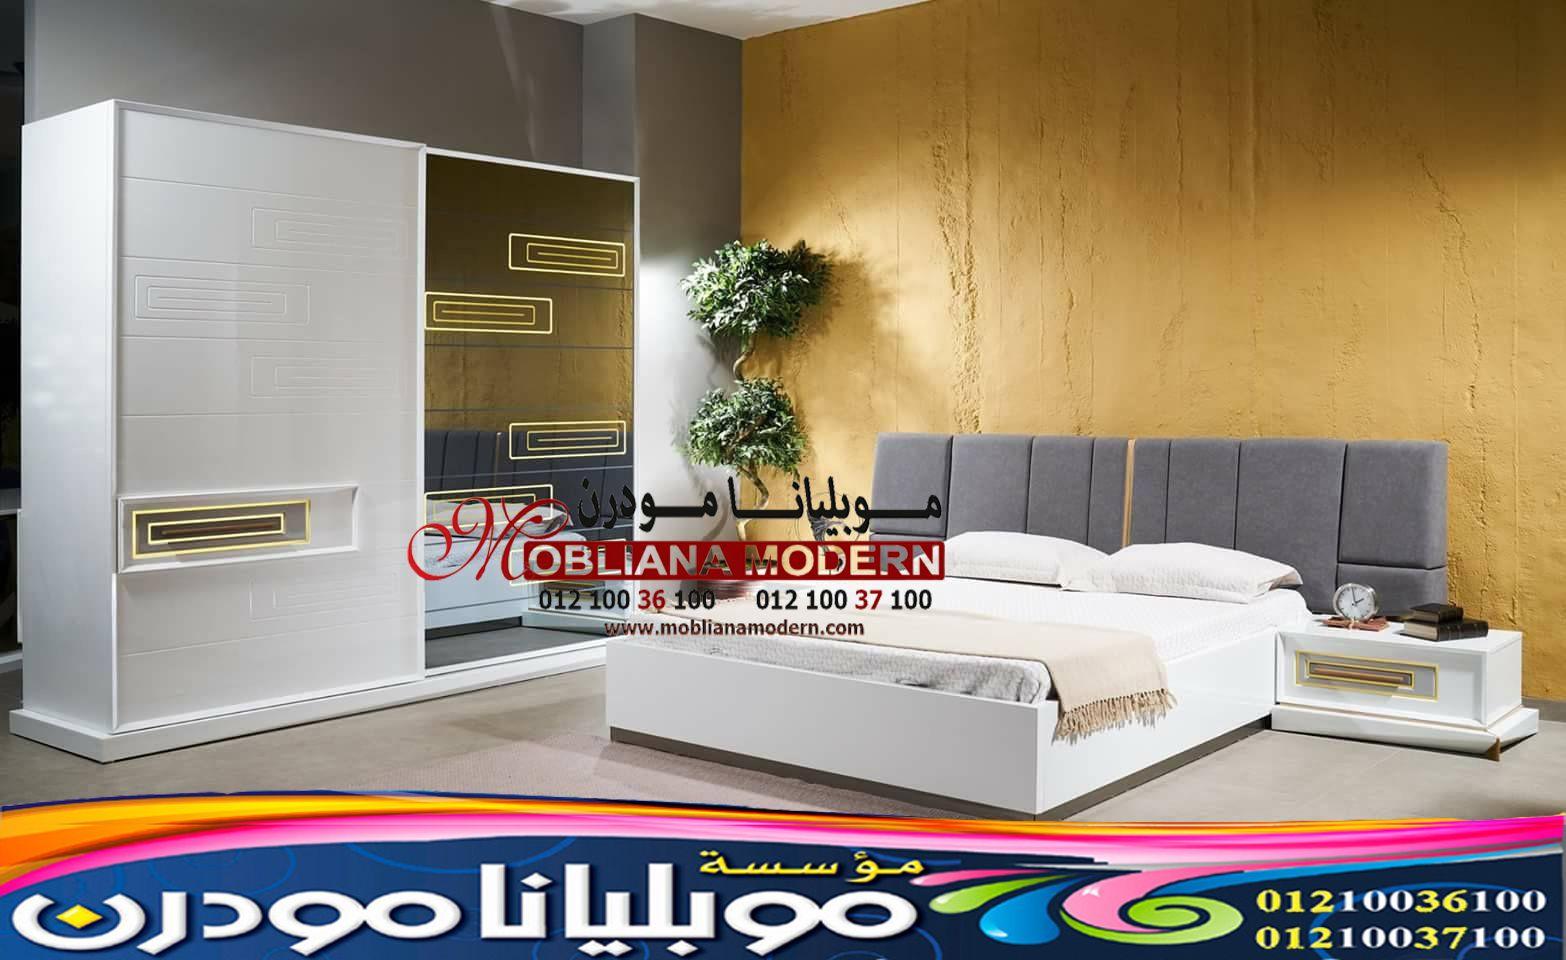 اثاث مودرن 2020 2021 سامح العوضي للاثاث المودرن In 2020 Home Decor Home Room